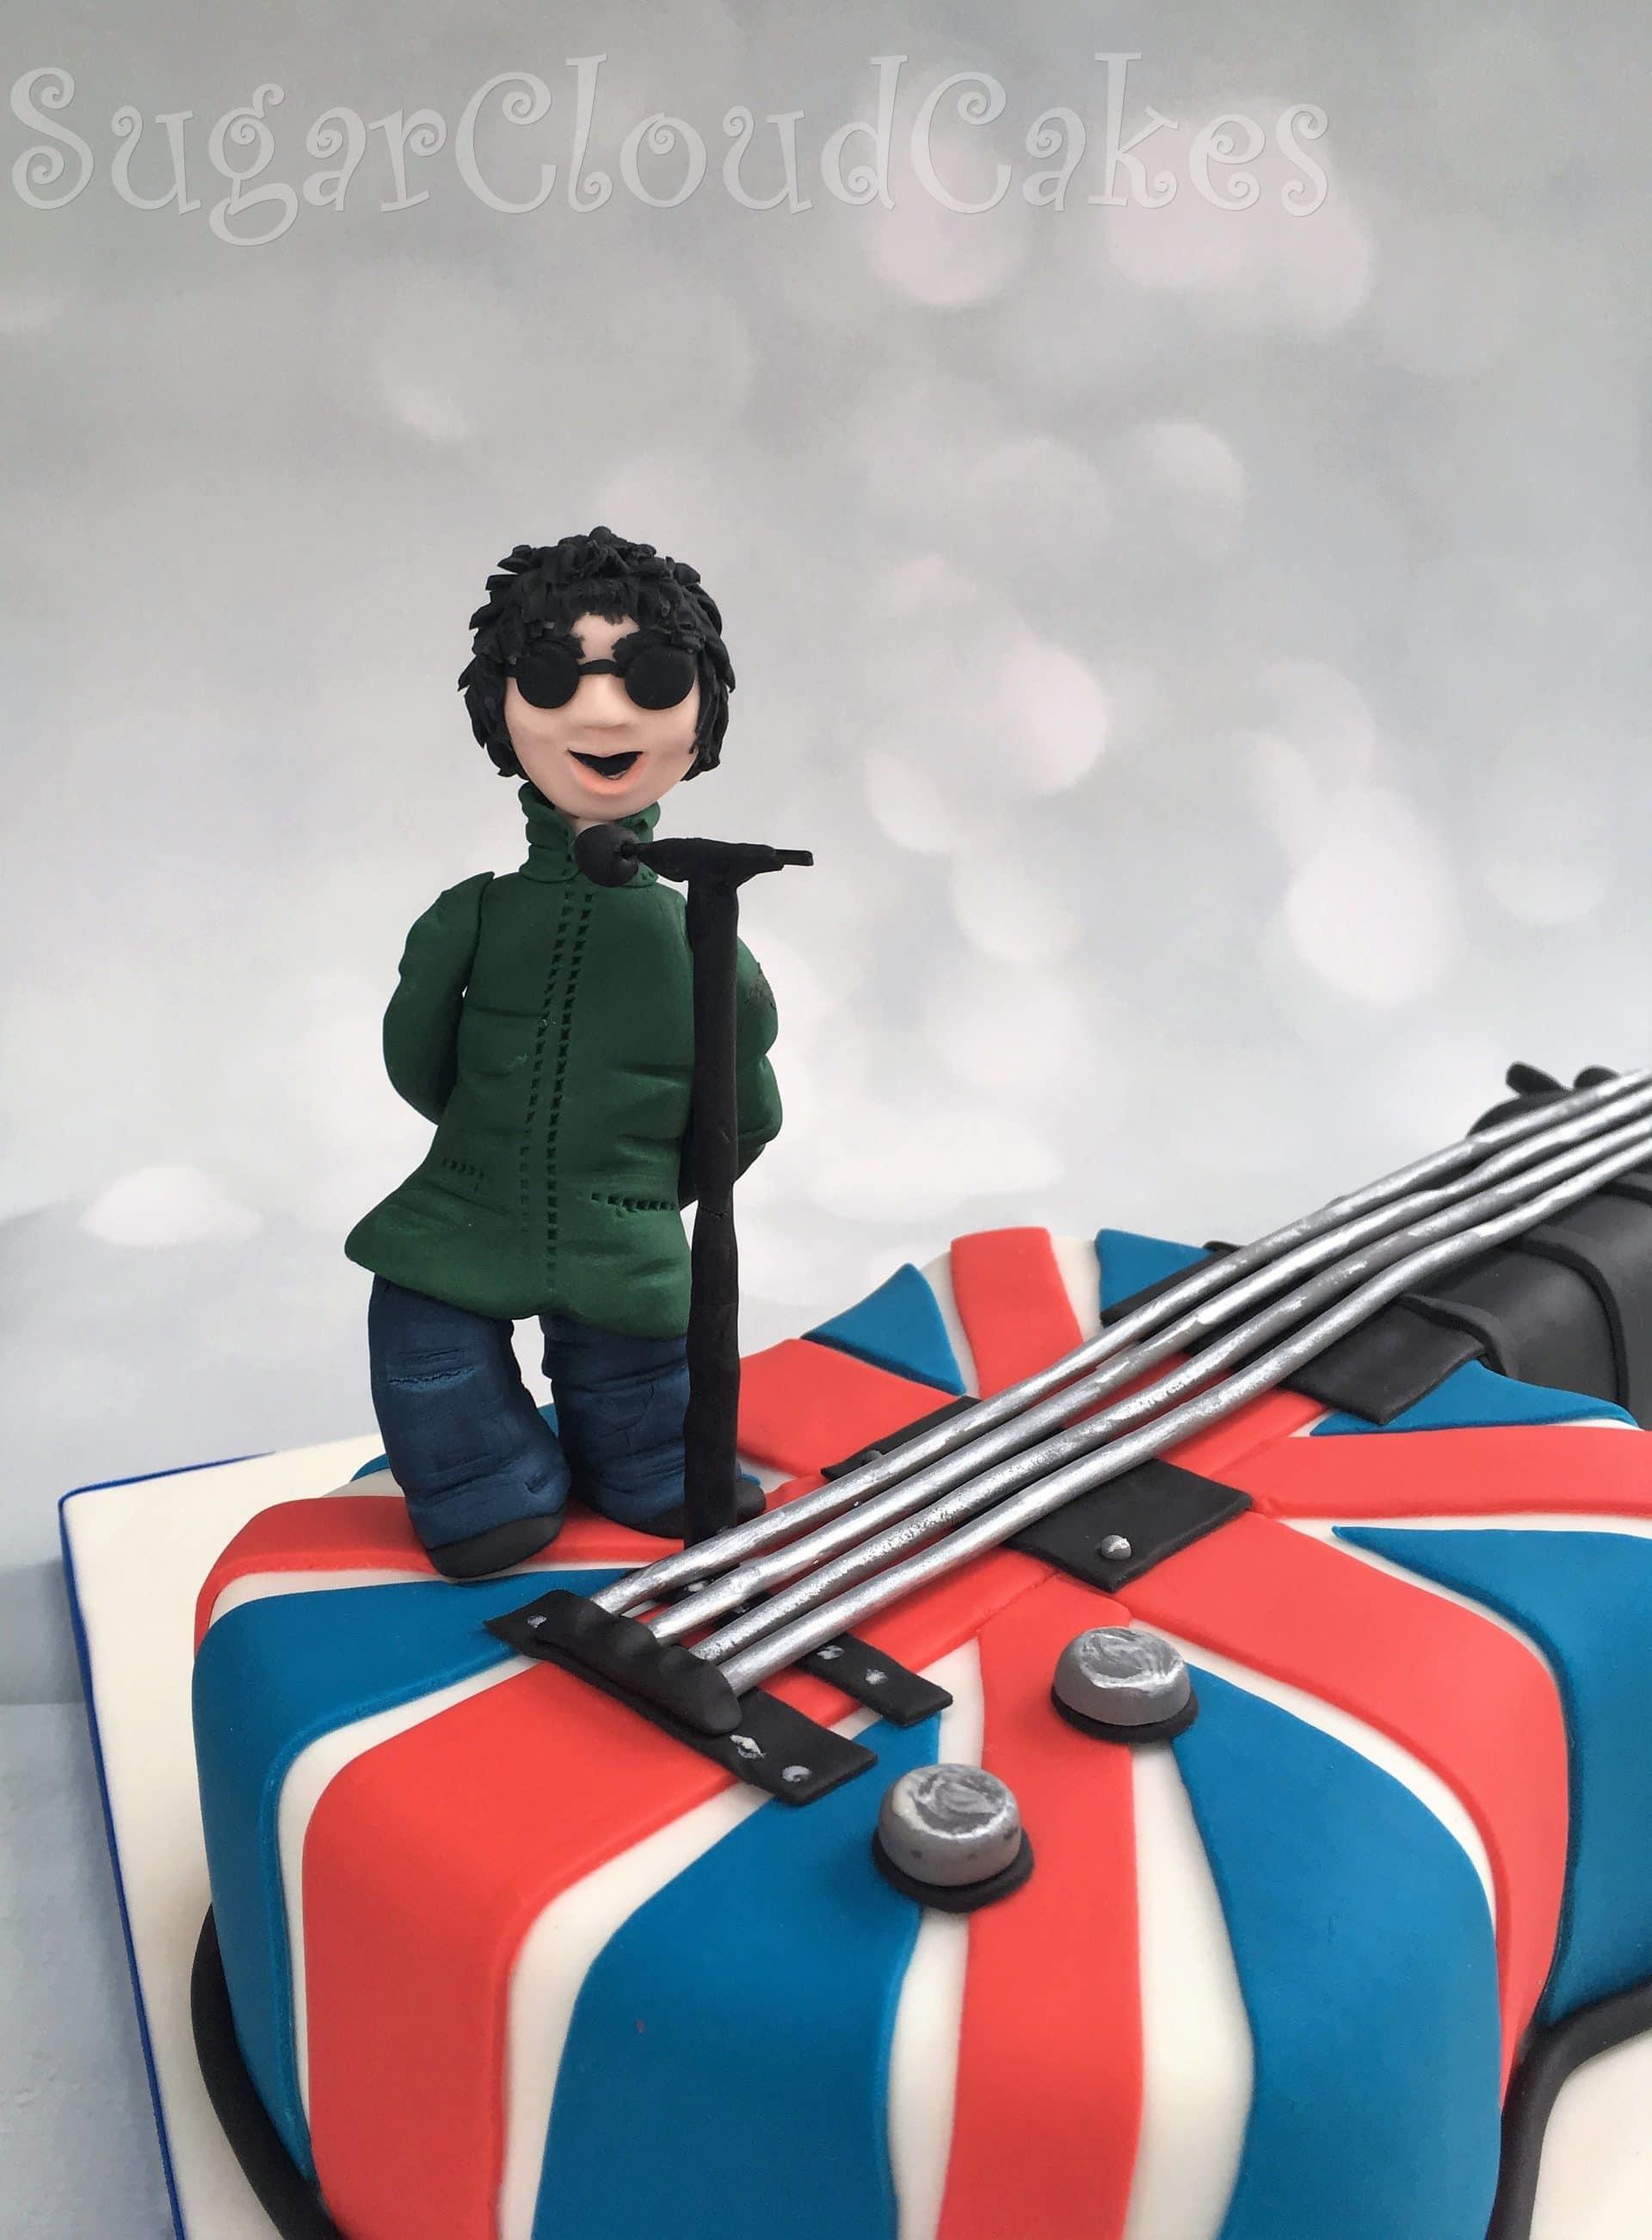 Liam Gallagher guitar shaped birthday cake